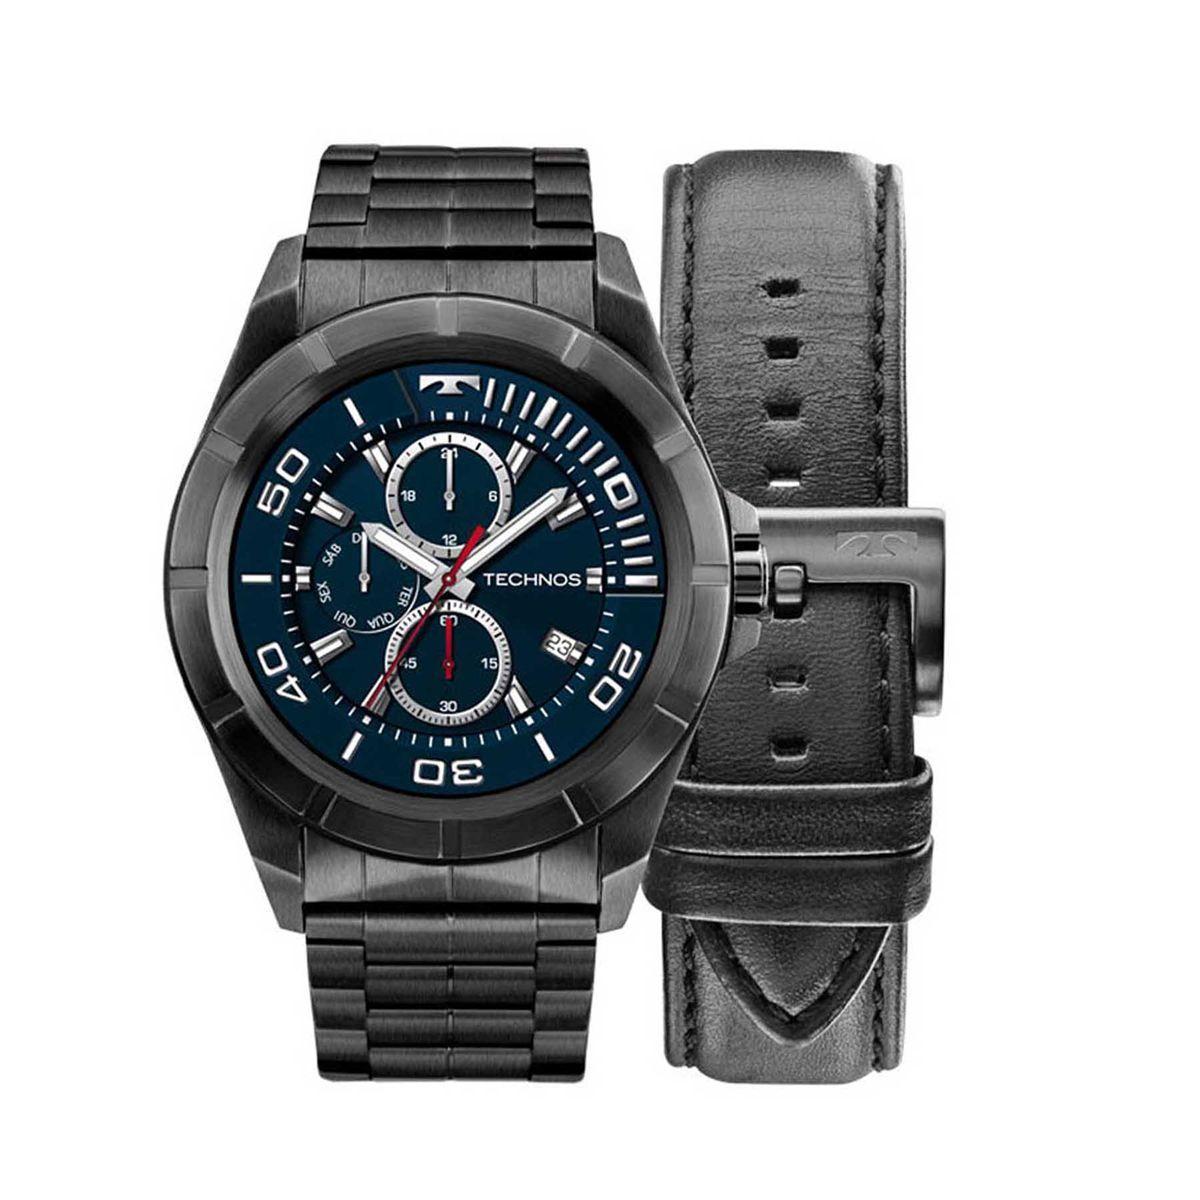 46552f97d20 Relógio Technos Skydriver Masculino Smartwatch Troca Pulseira SRAC 4P R   1.276